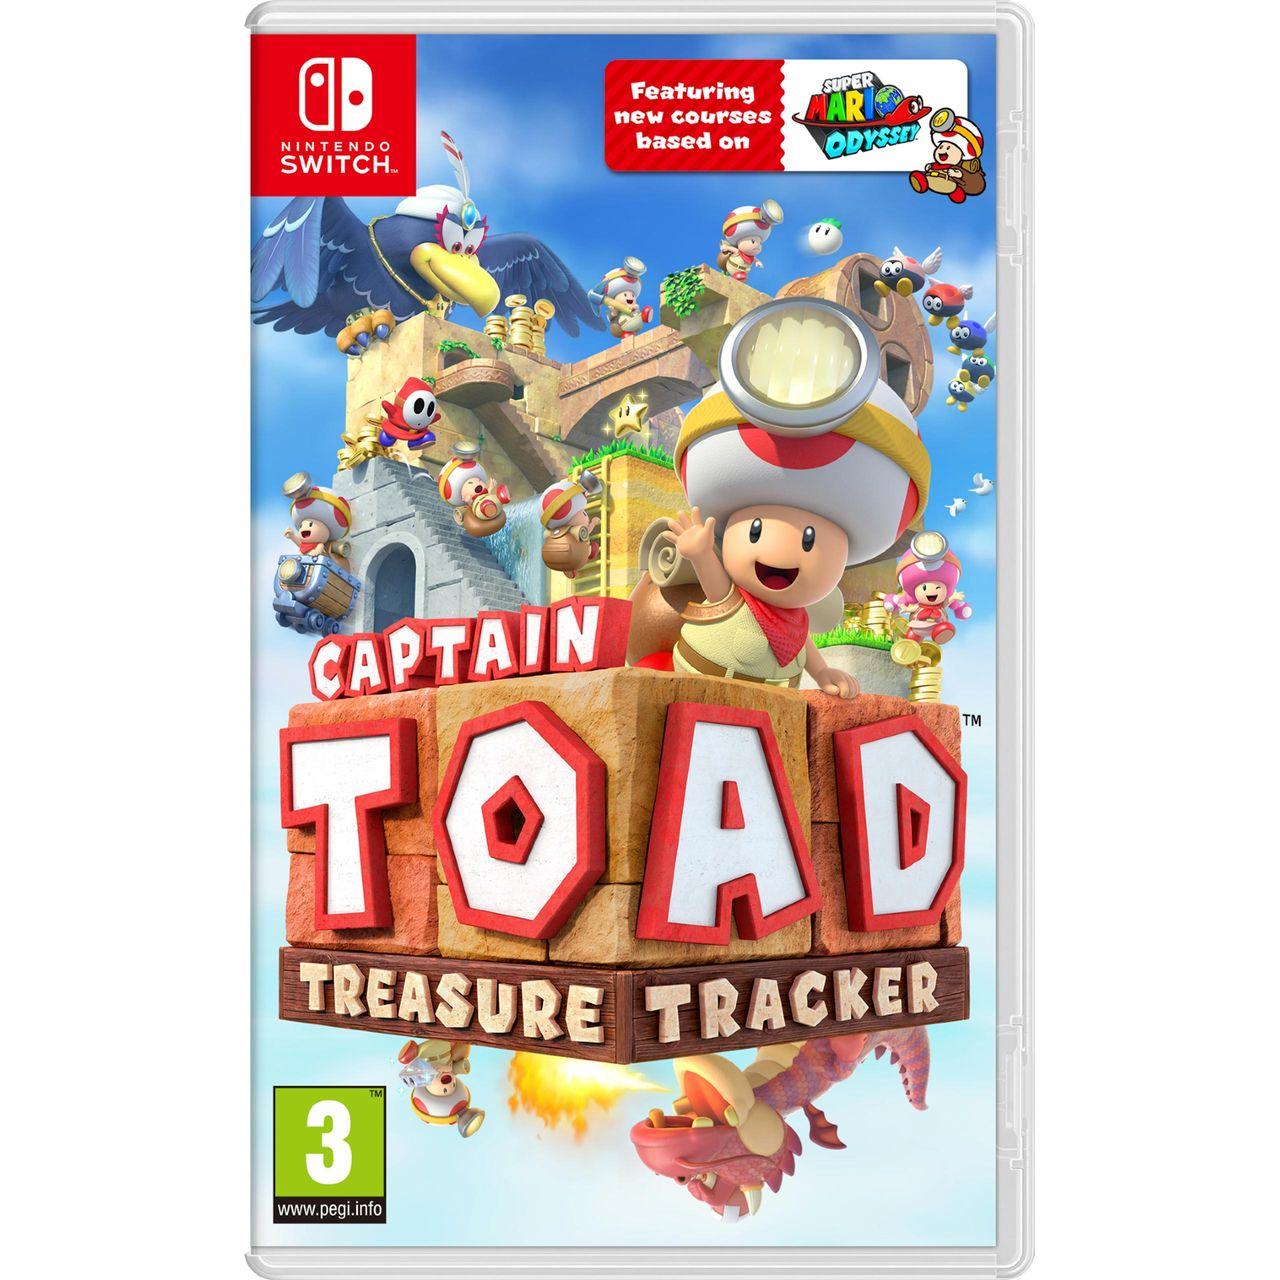 Captain Toad Treasure Tracker (Switch) £27 at AO